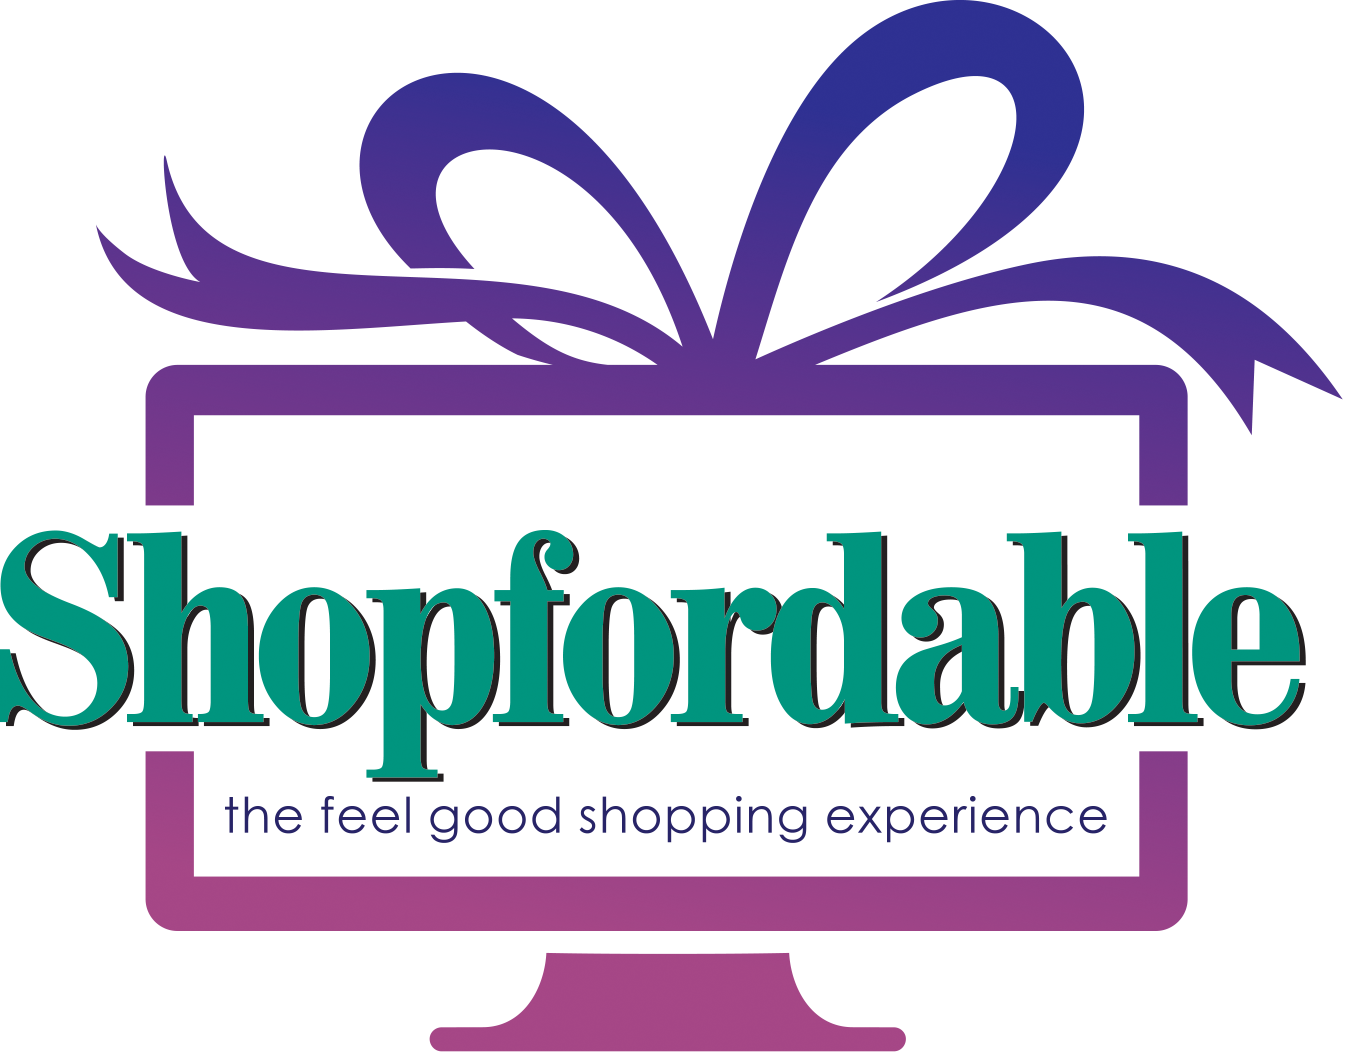 Logo design for Shopfordable